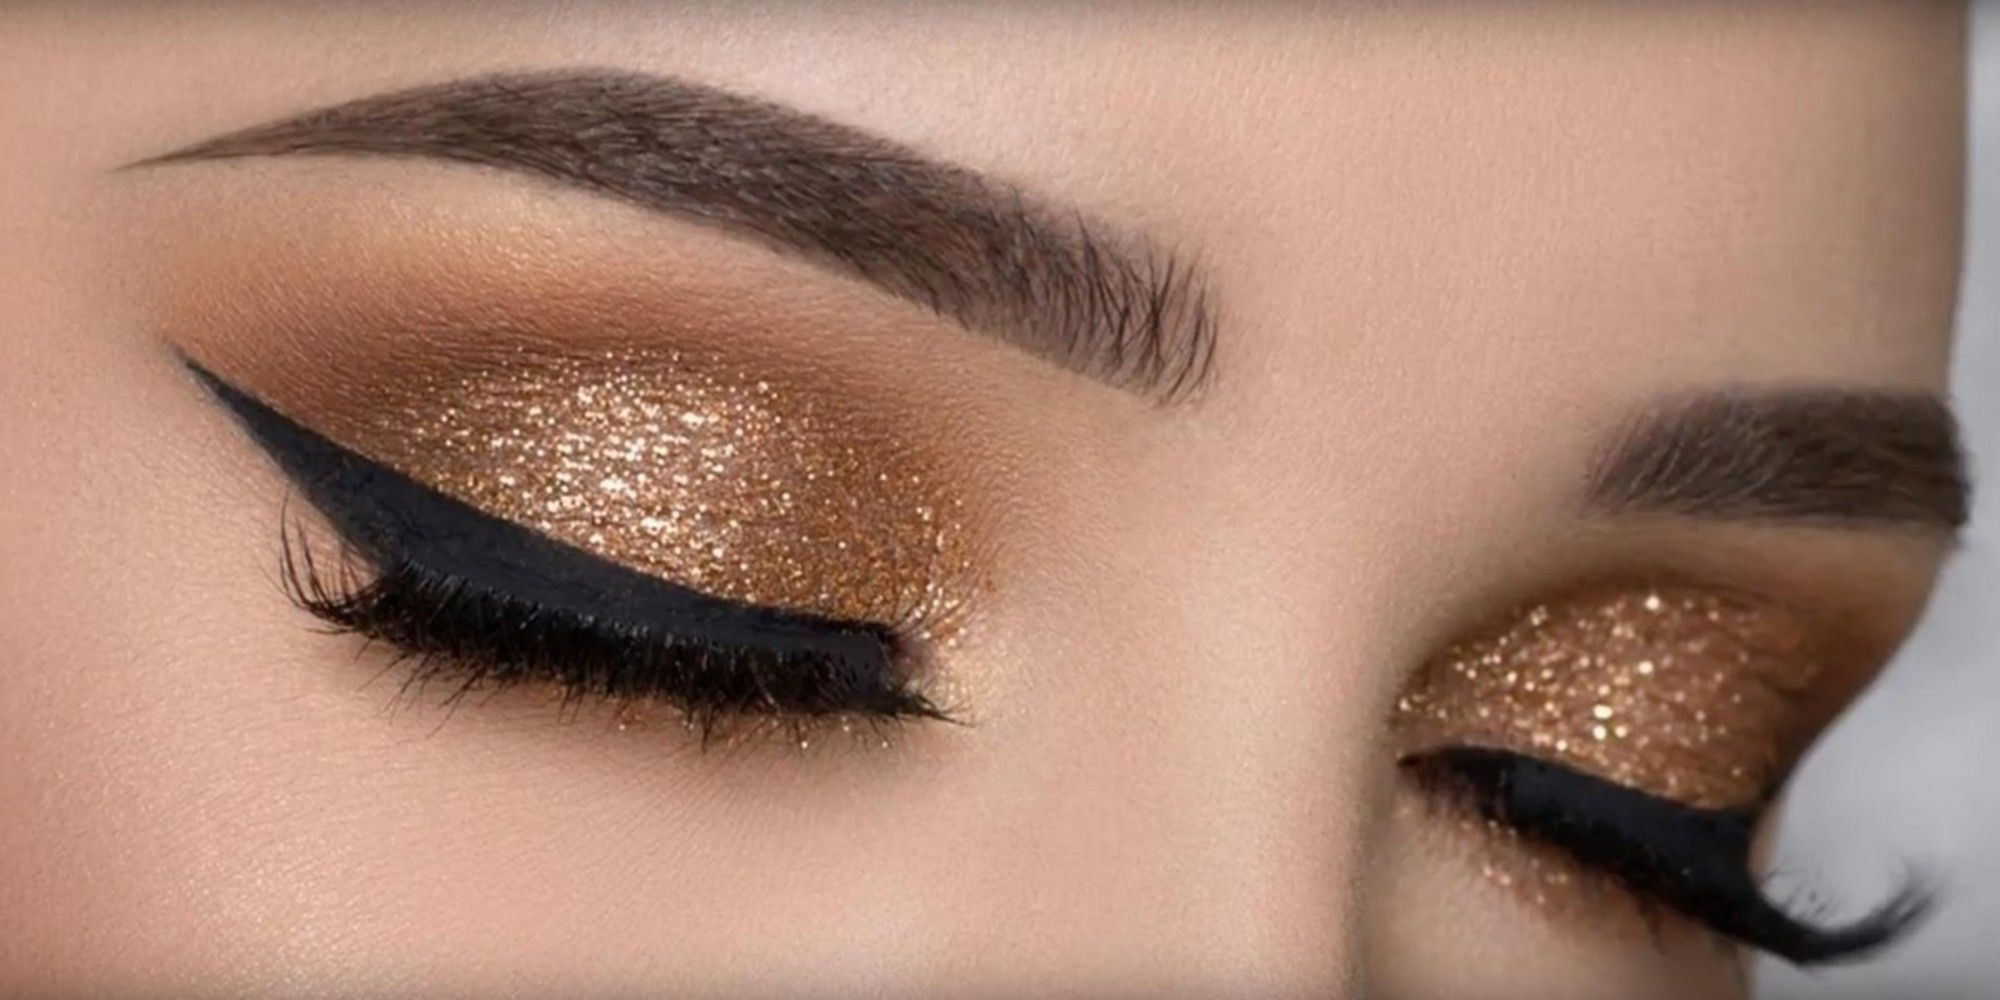 Golden sparkle makeup!!! Love this look by BeatfacRocs